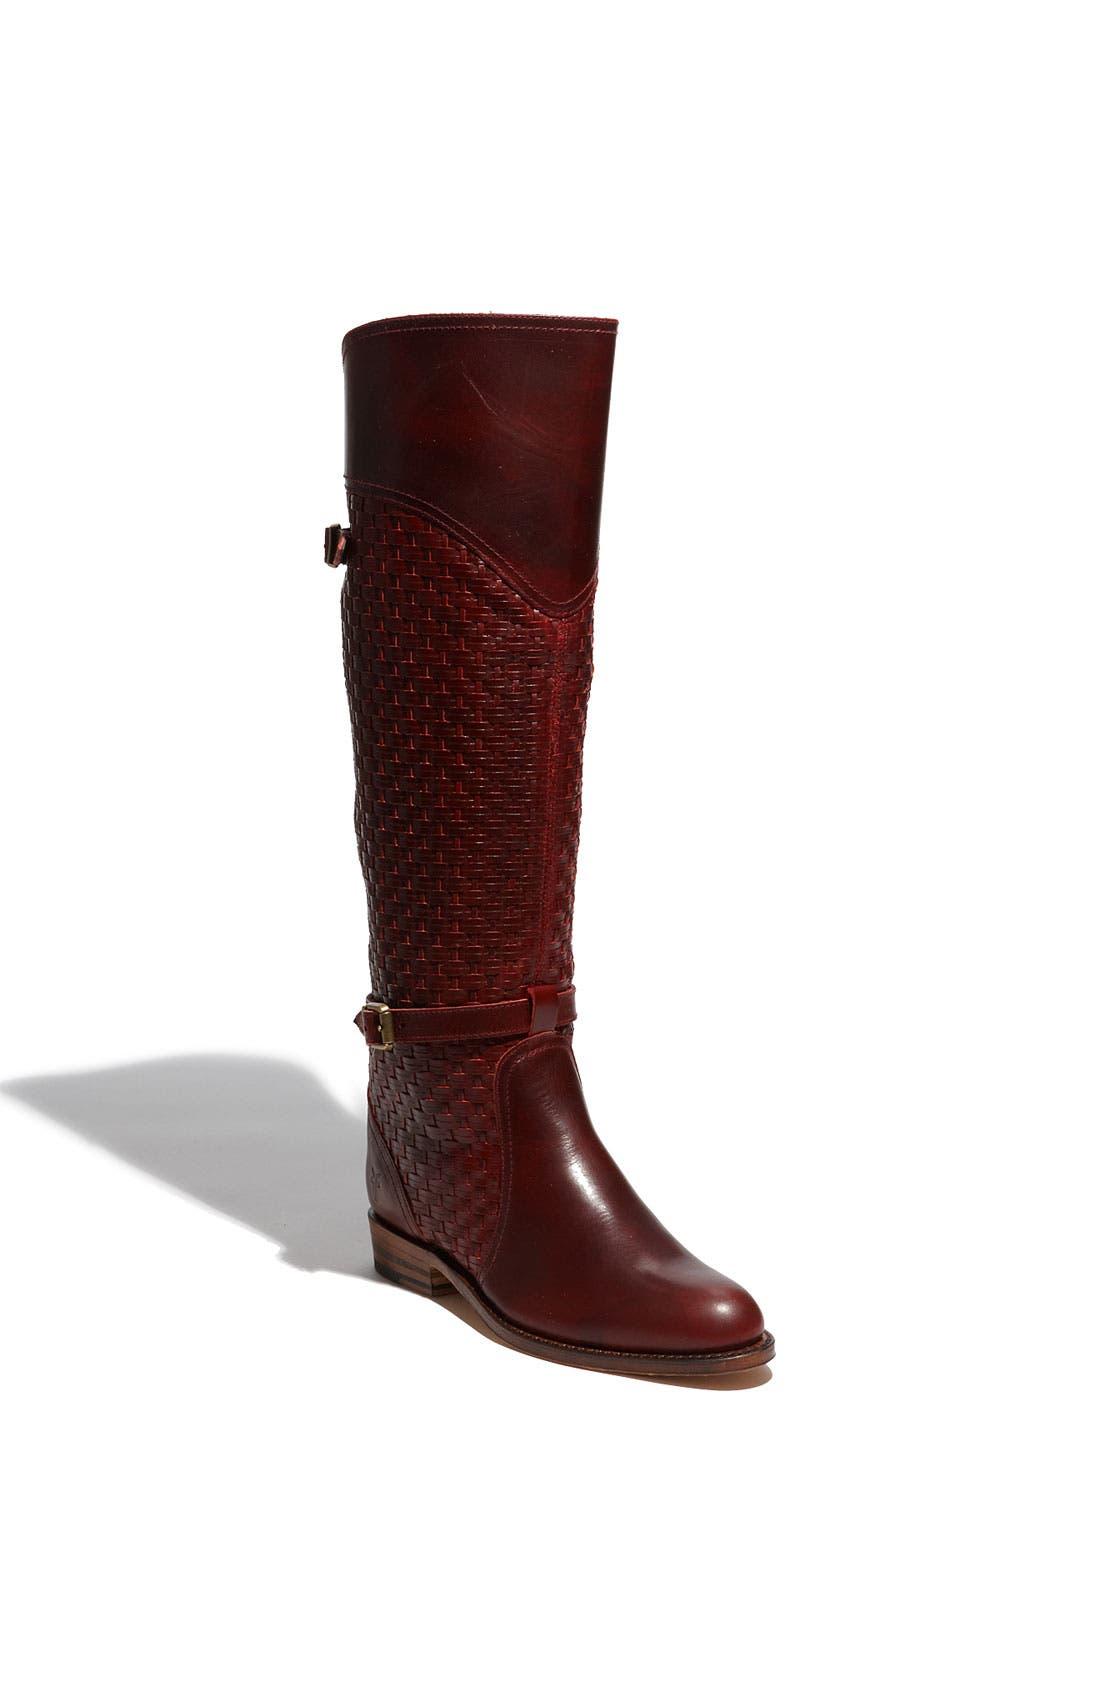 Main Image - Frye 'Dorado' Riding Boot